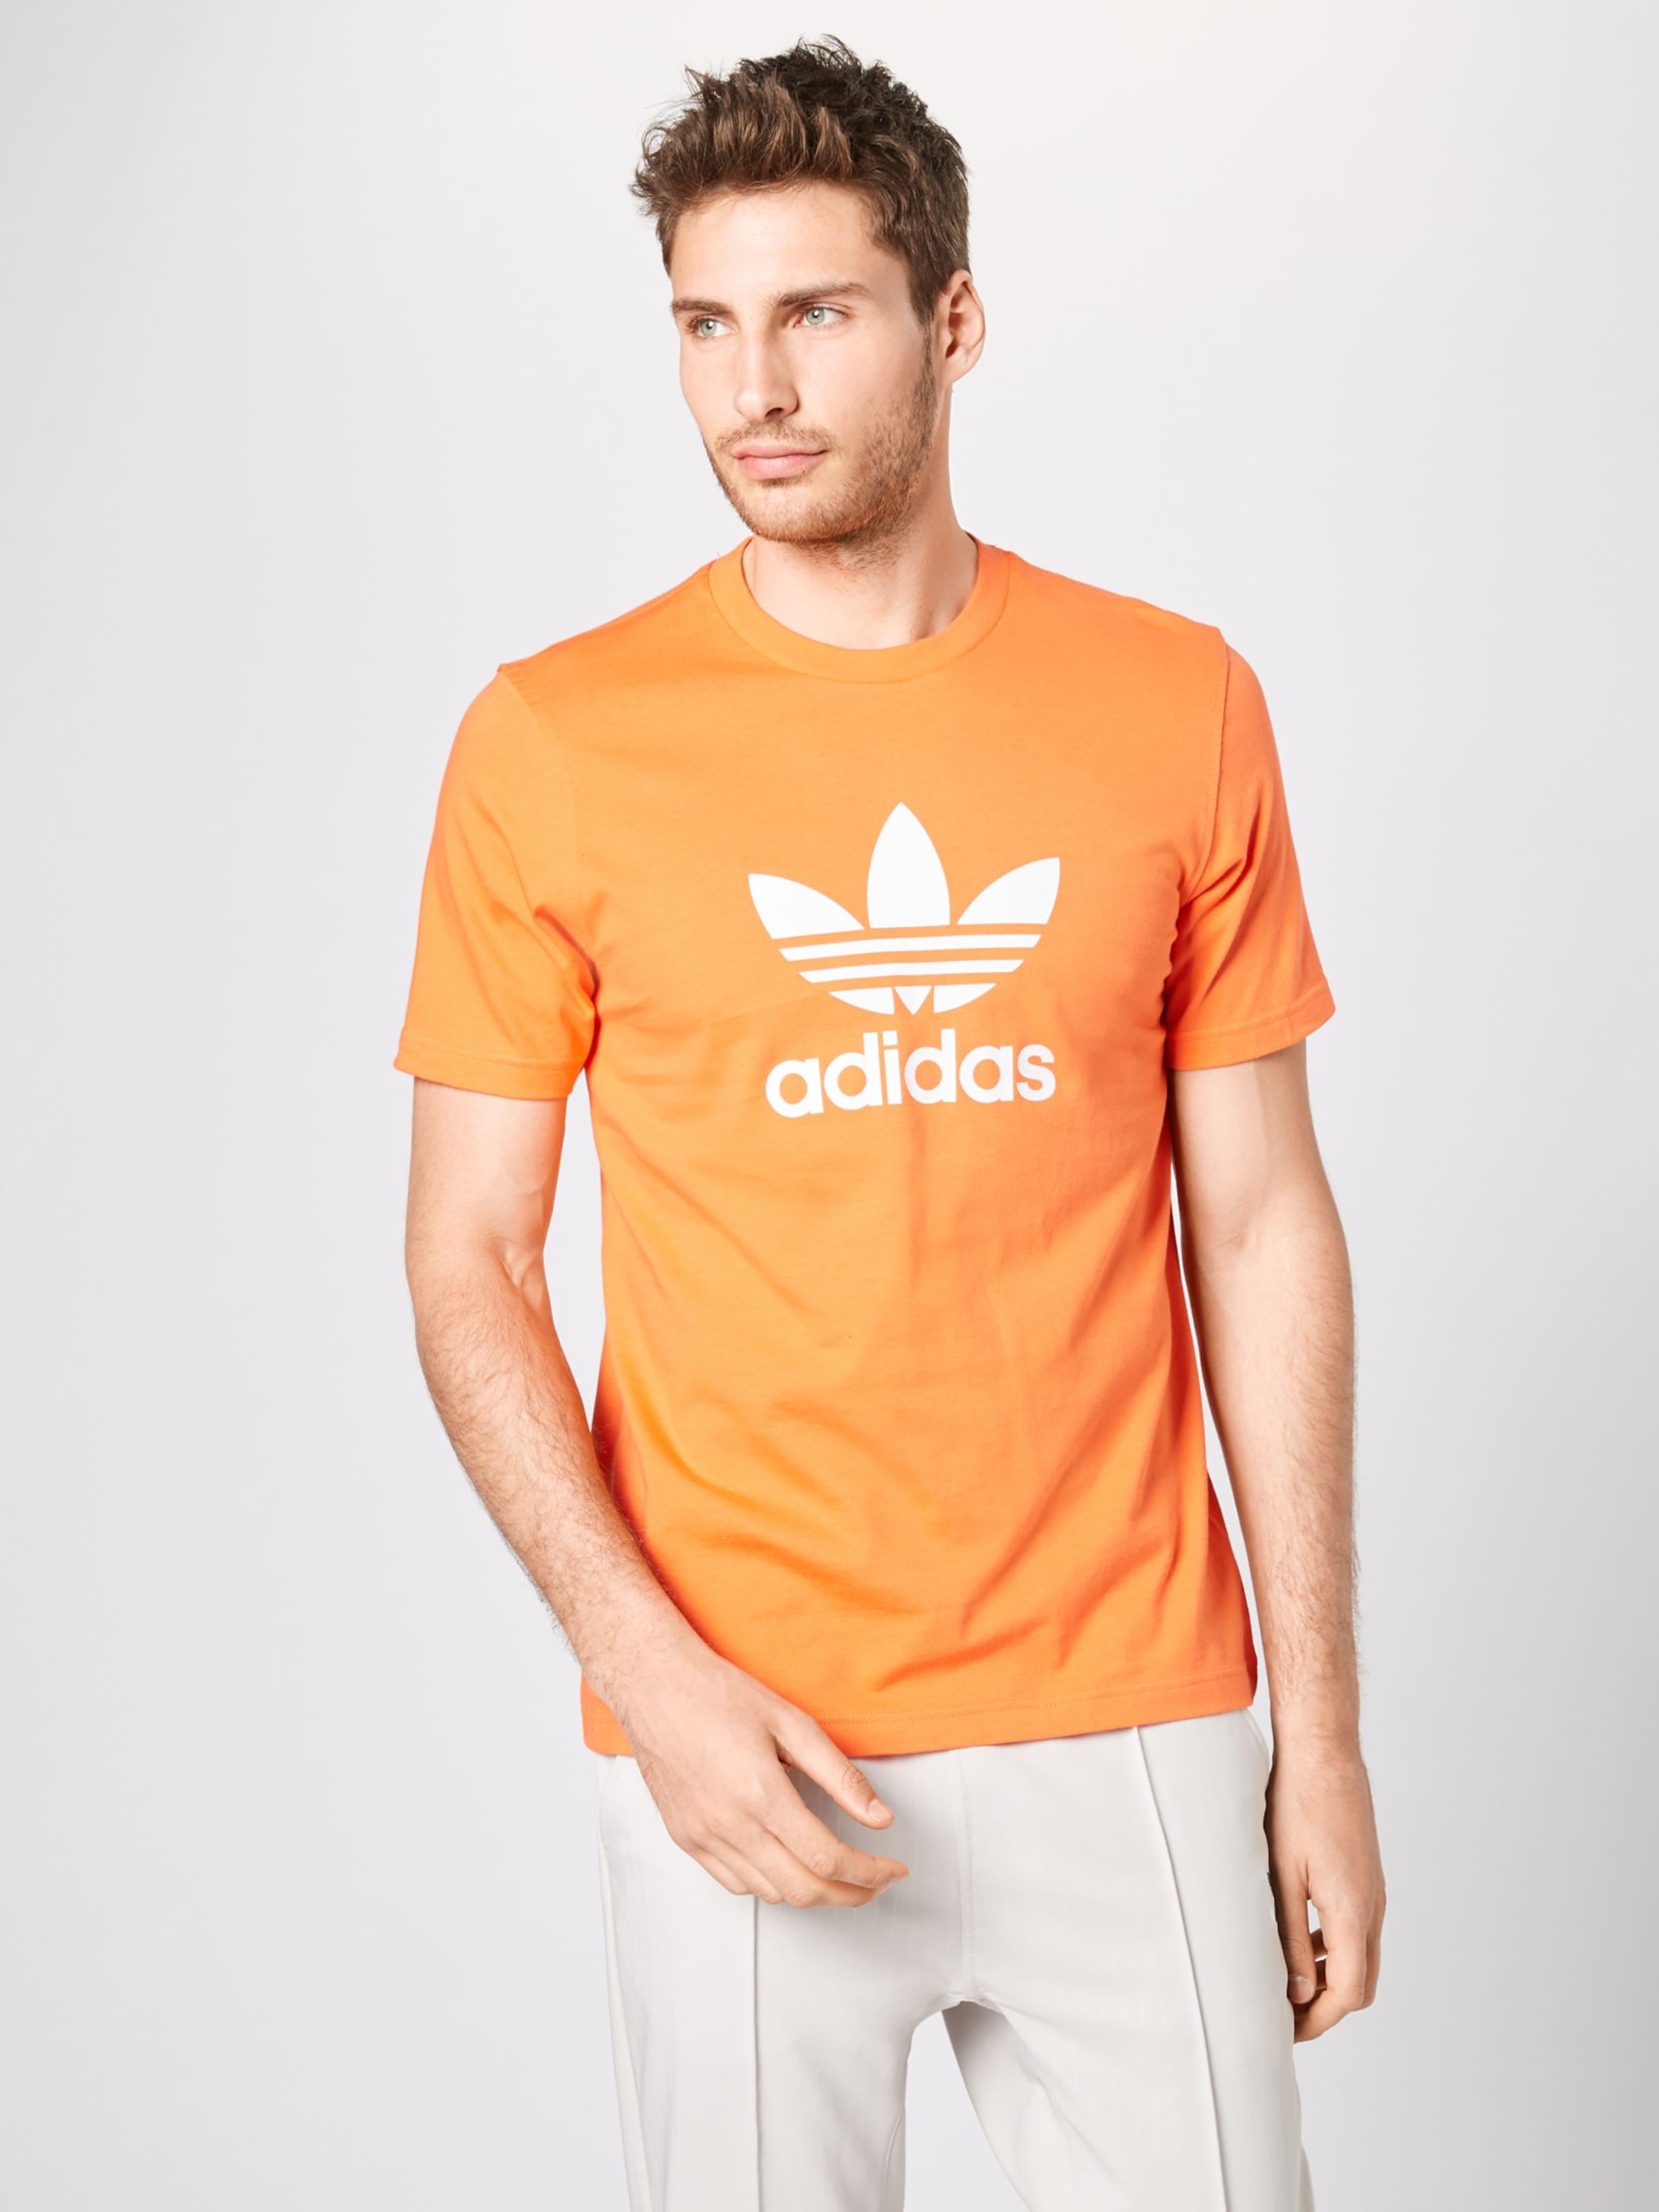 In shirt Originals T 'trefoil' OrangeWeiß Adidas xedCrBo